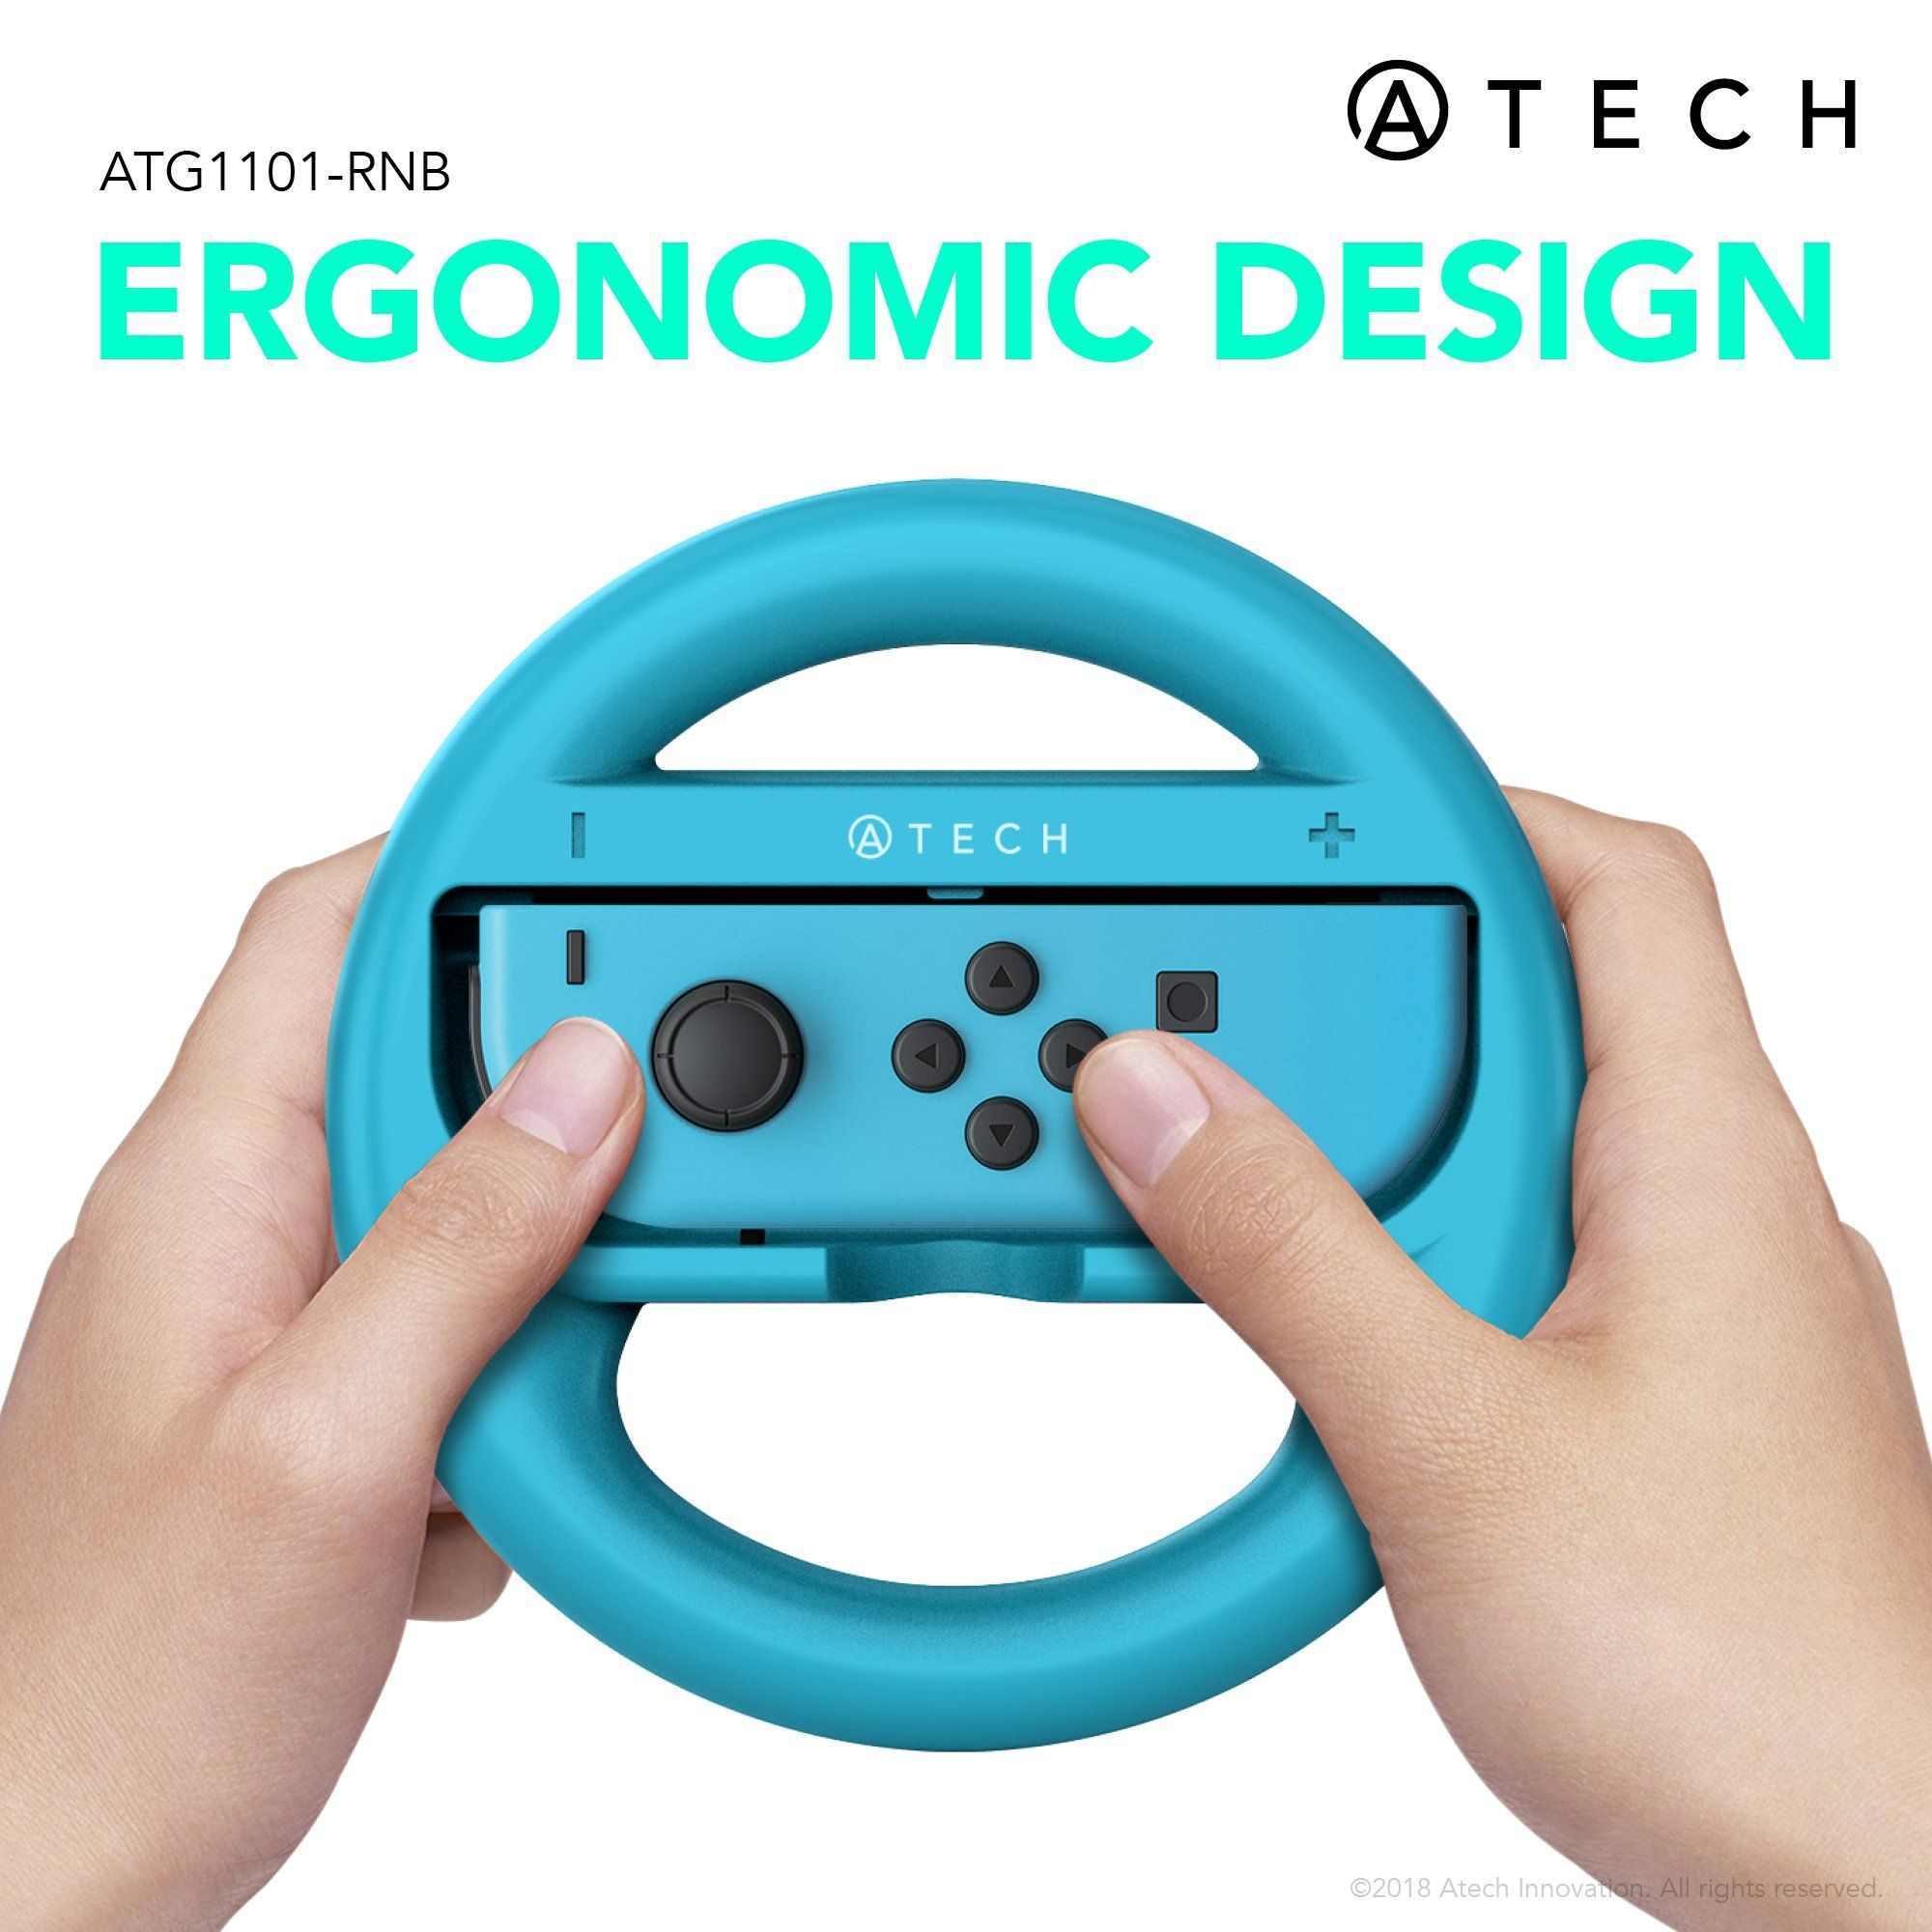 Atech Innovation Nintendo Switch Steering Wheel Mario Kart